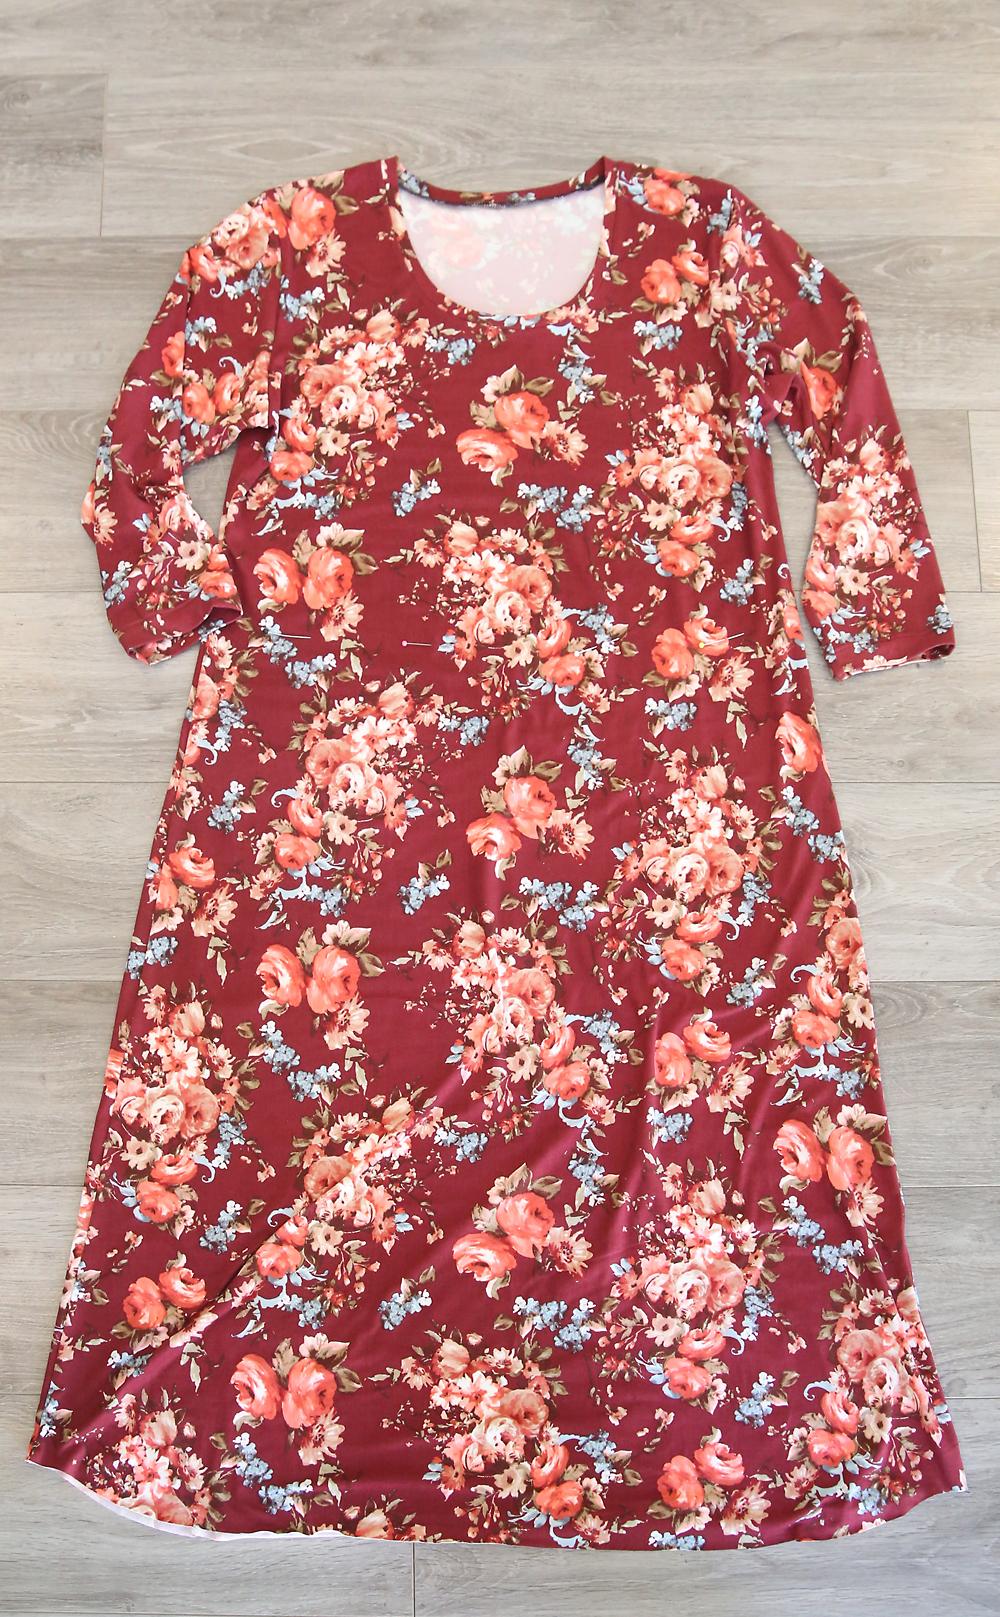 A midi length t-shirt dress laying on the floor